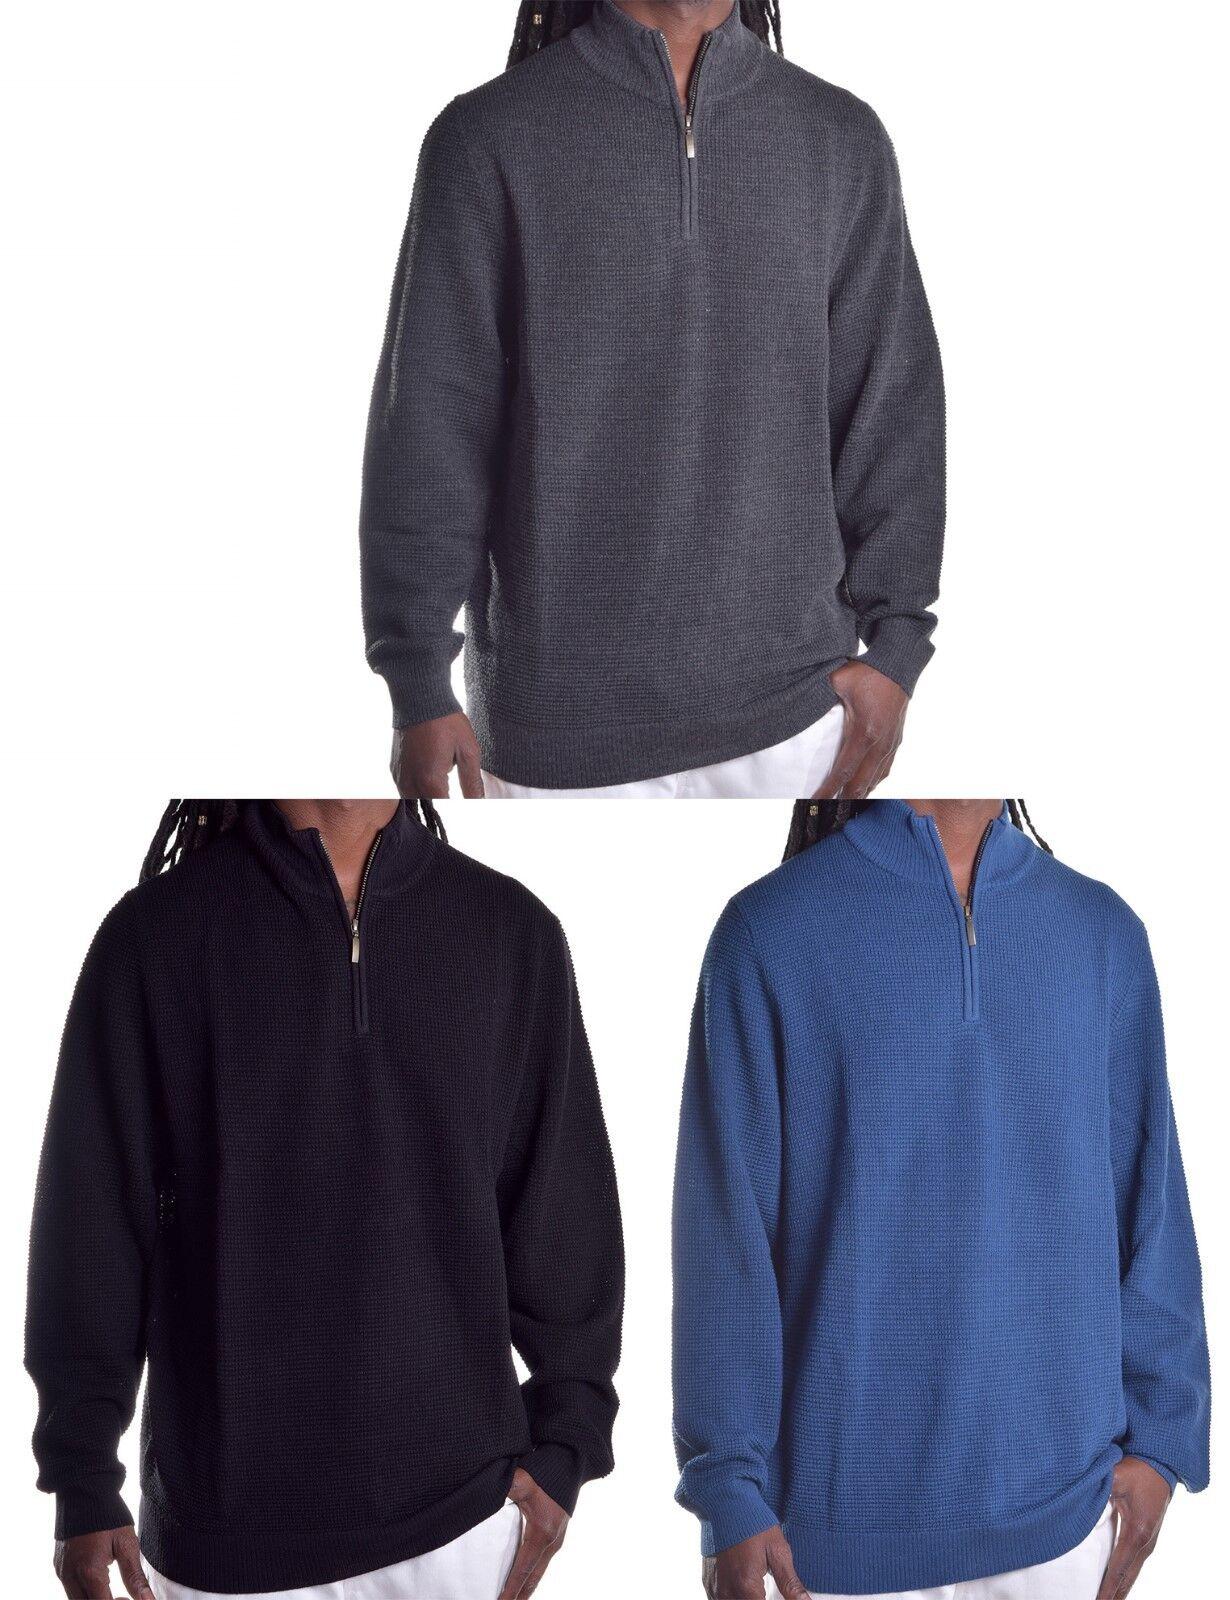 Club Room Men's  1 4 Zip Knit Merino Wool Blend Sweater Choose color & Size